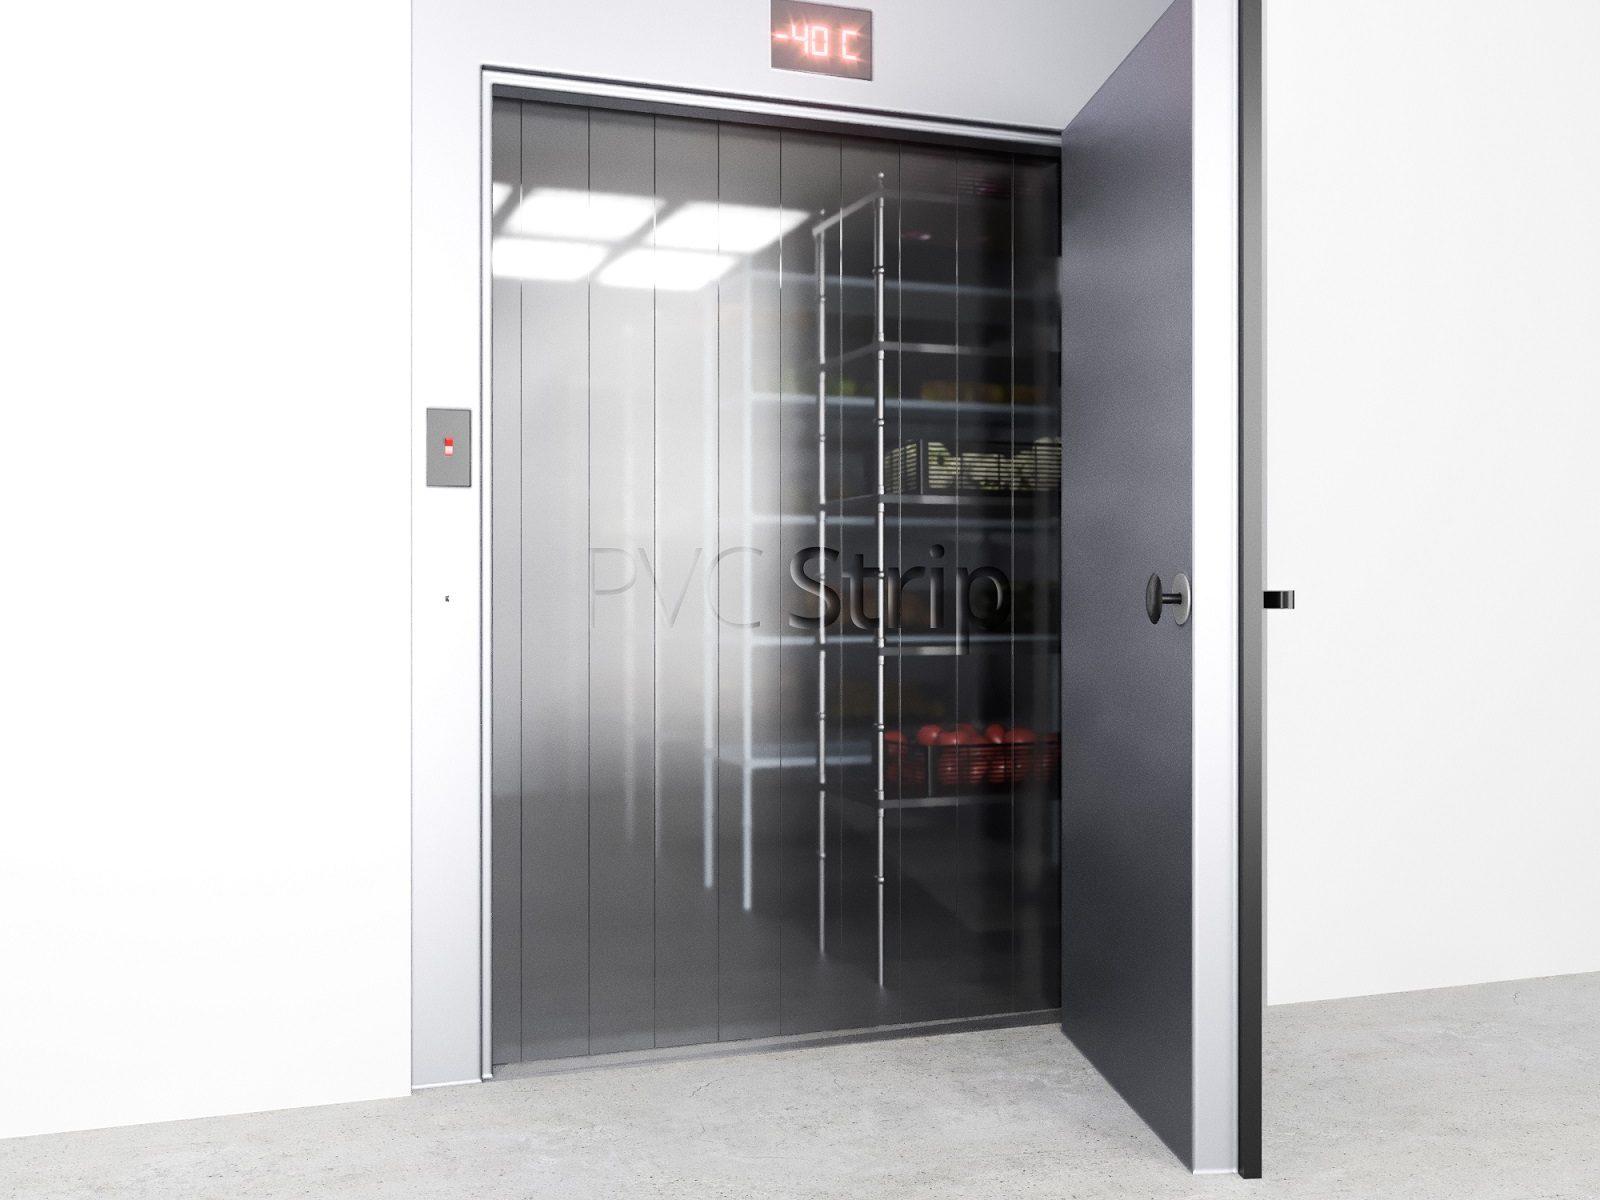 Cold Storage and Freezer PVC Strip Curtain